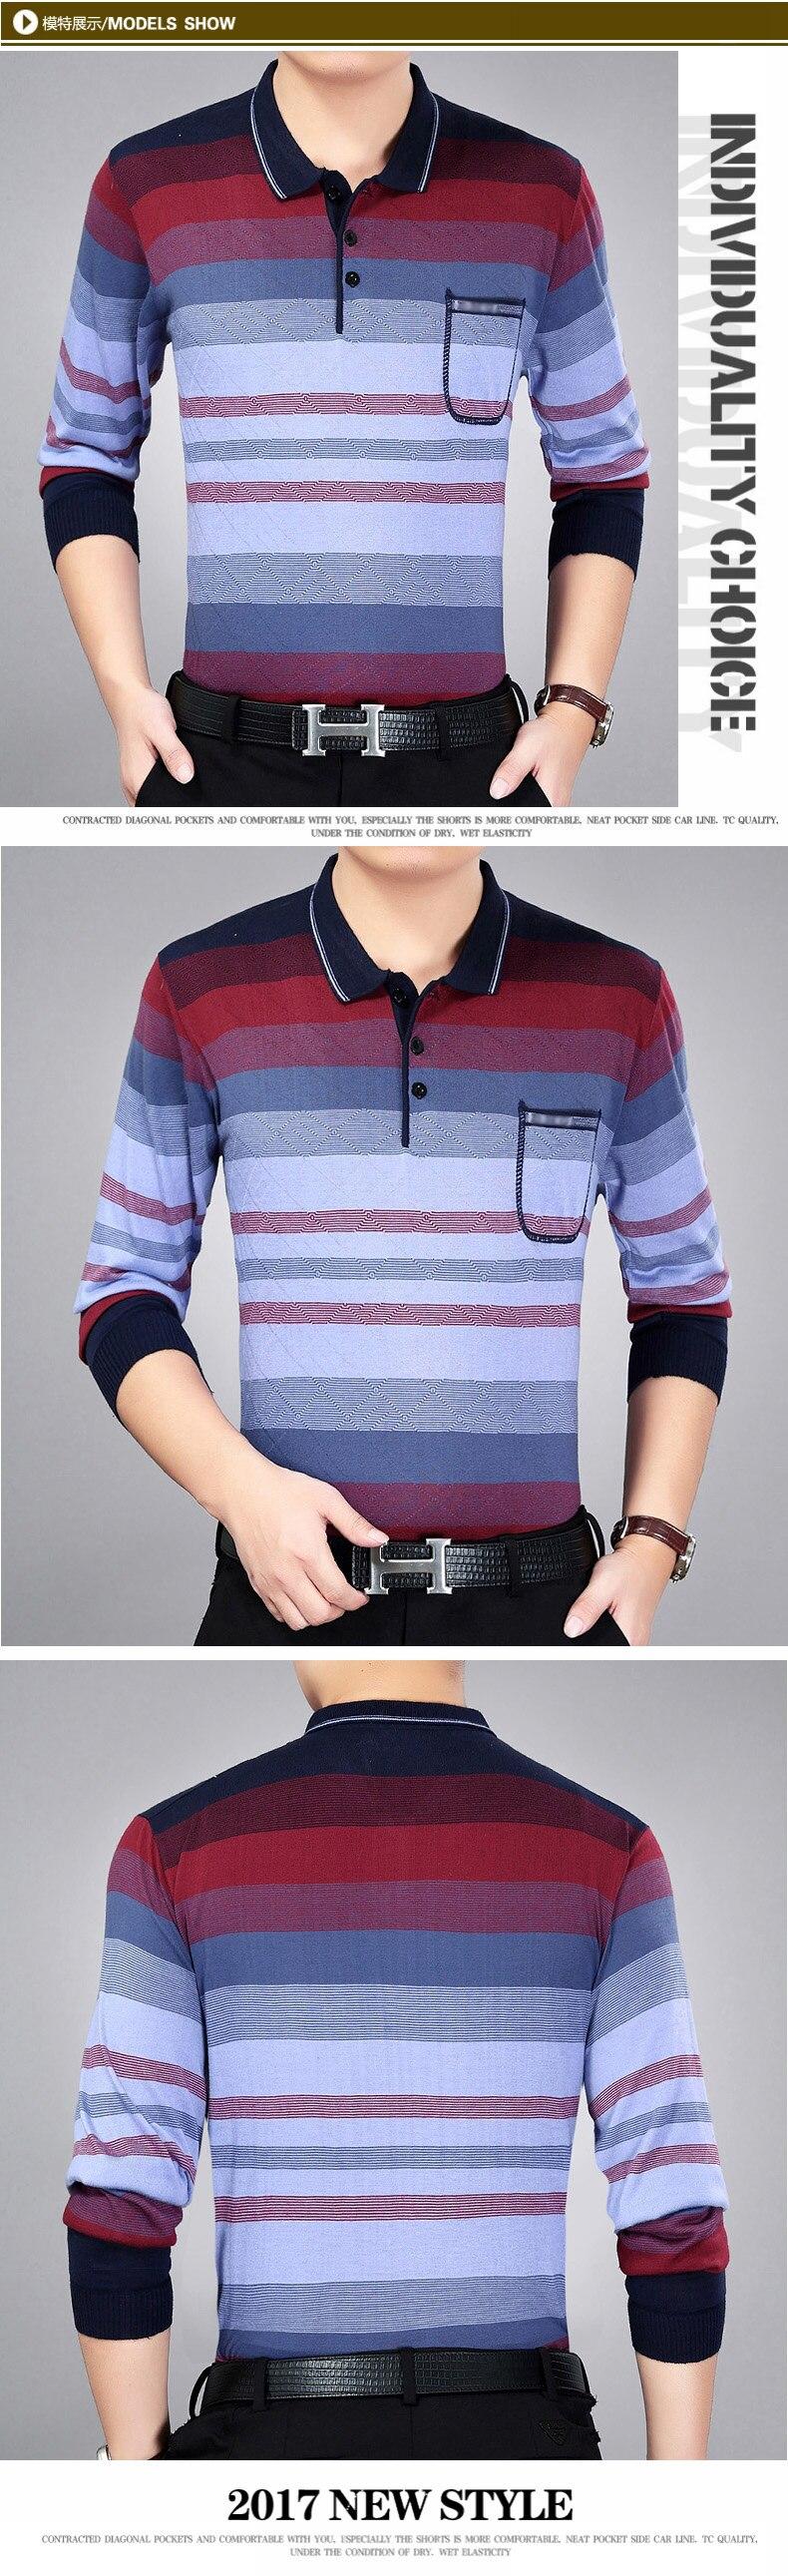 WAEOLSA Men Casual Shirt Turn Down Top Cross Stripe Man Blue Red Blouses Male Gradual Color Shirts Man Leisure Shirts (3)